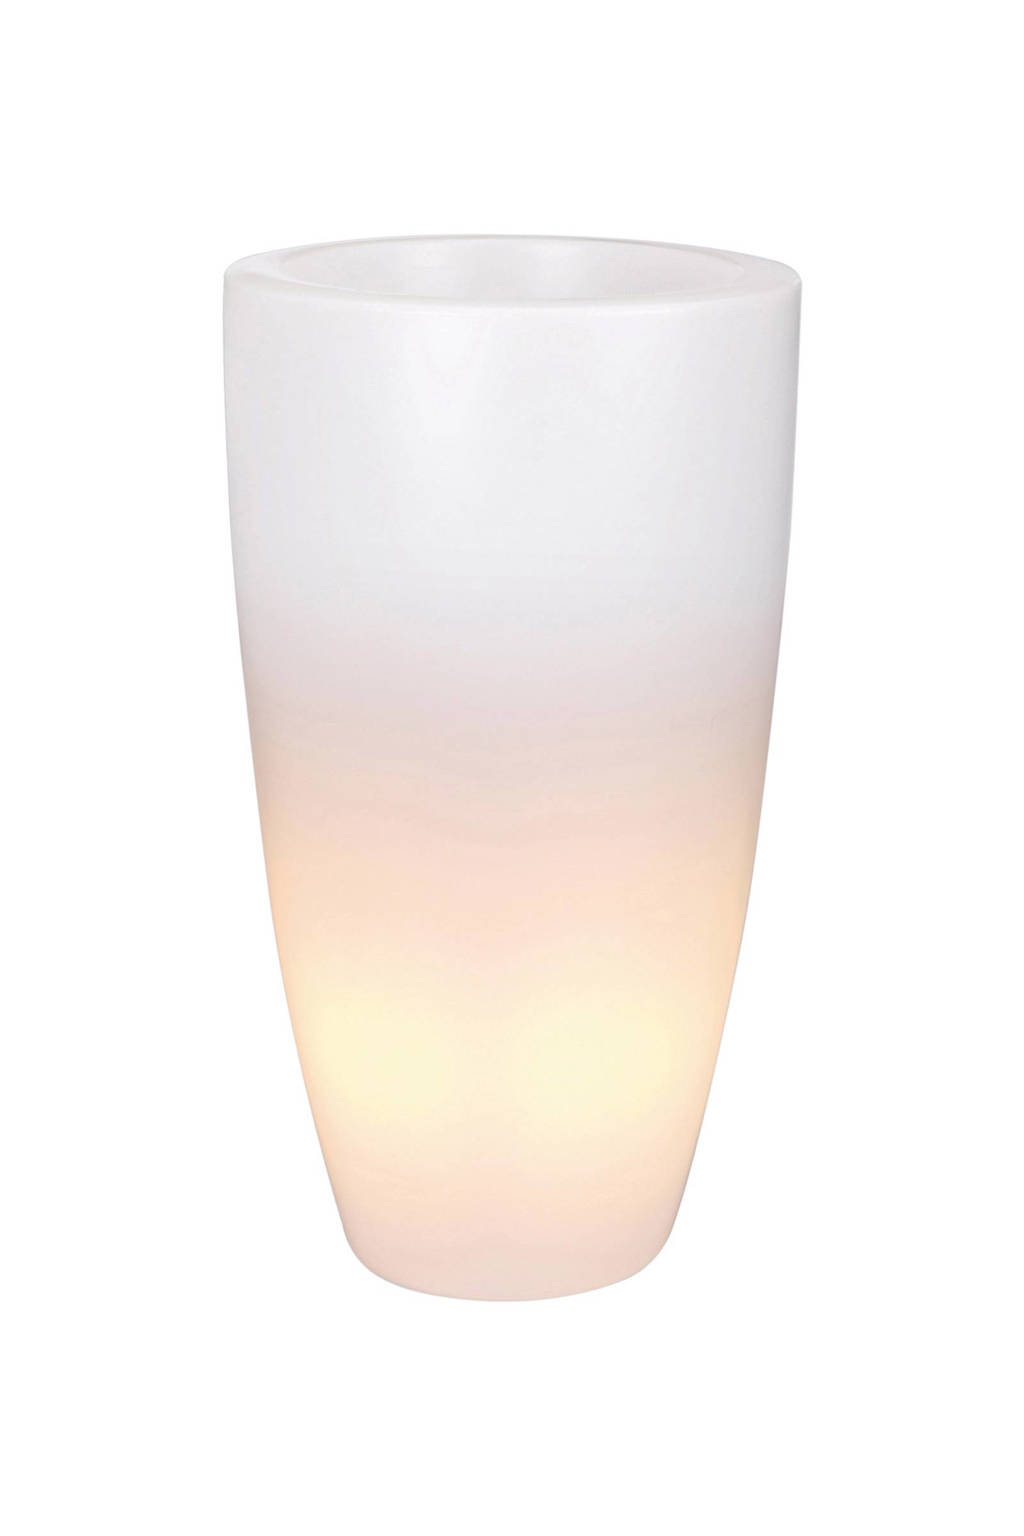 Elho bloempot Pure Soft LED (ø40 cm), Transparant